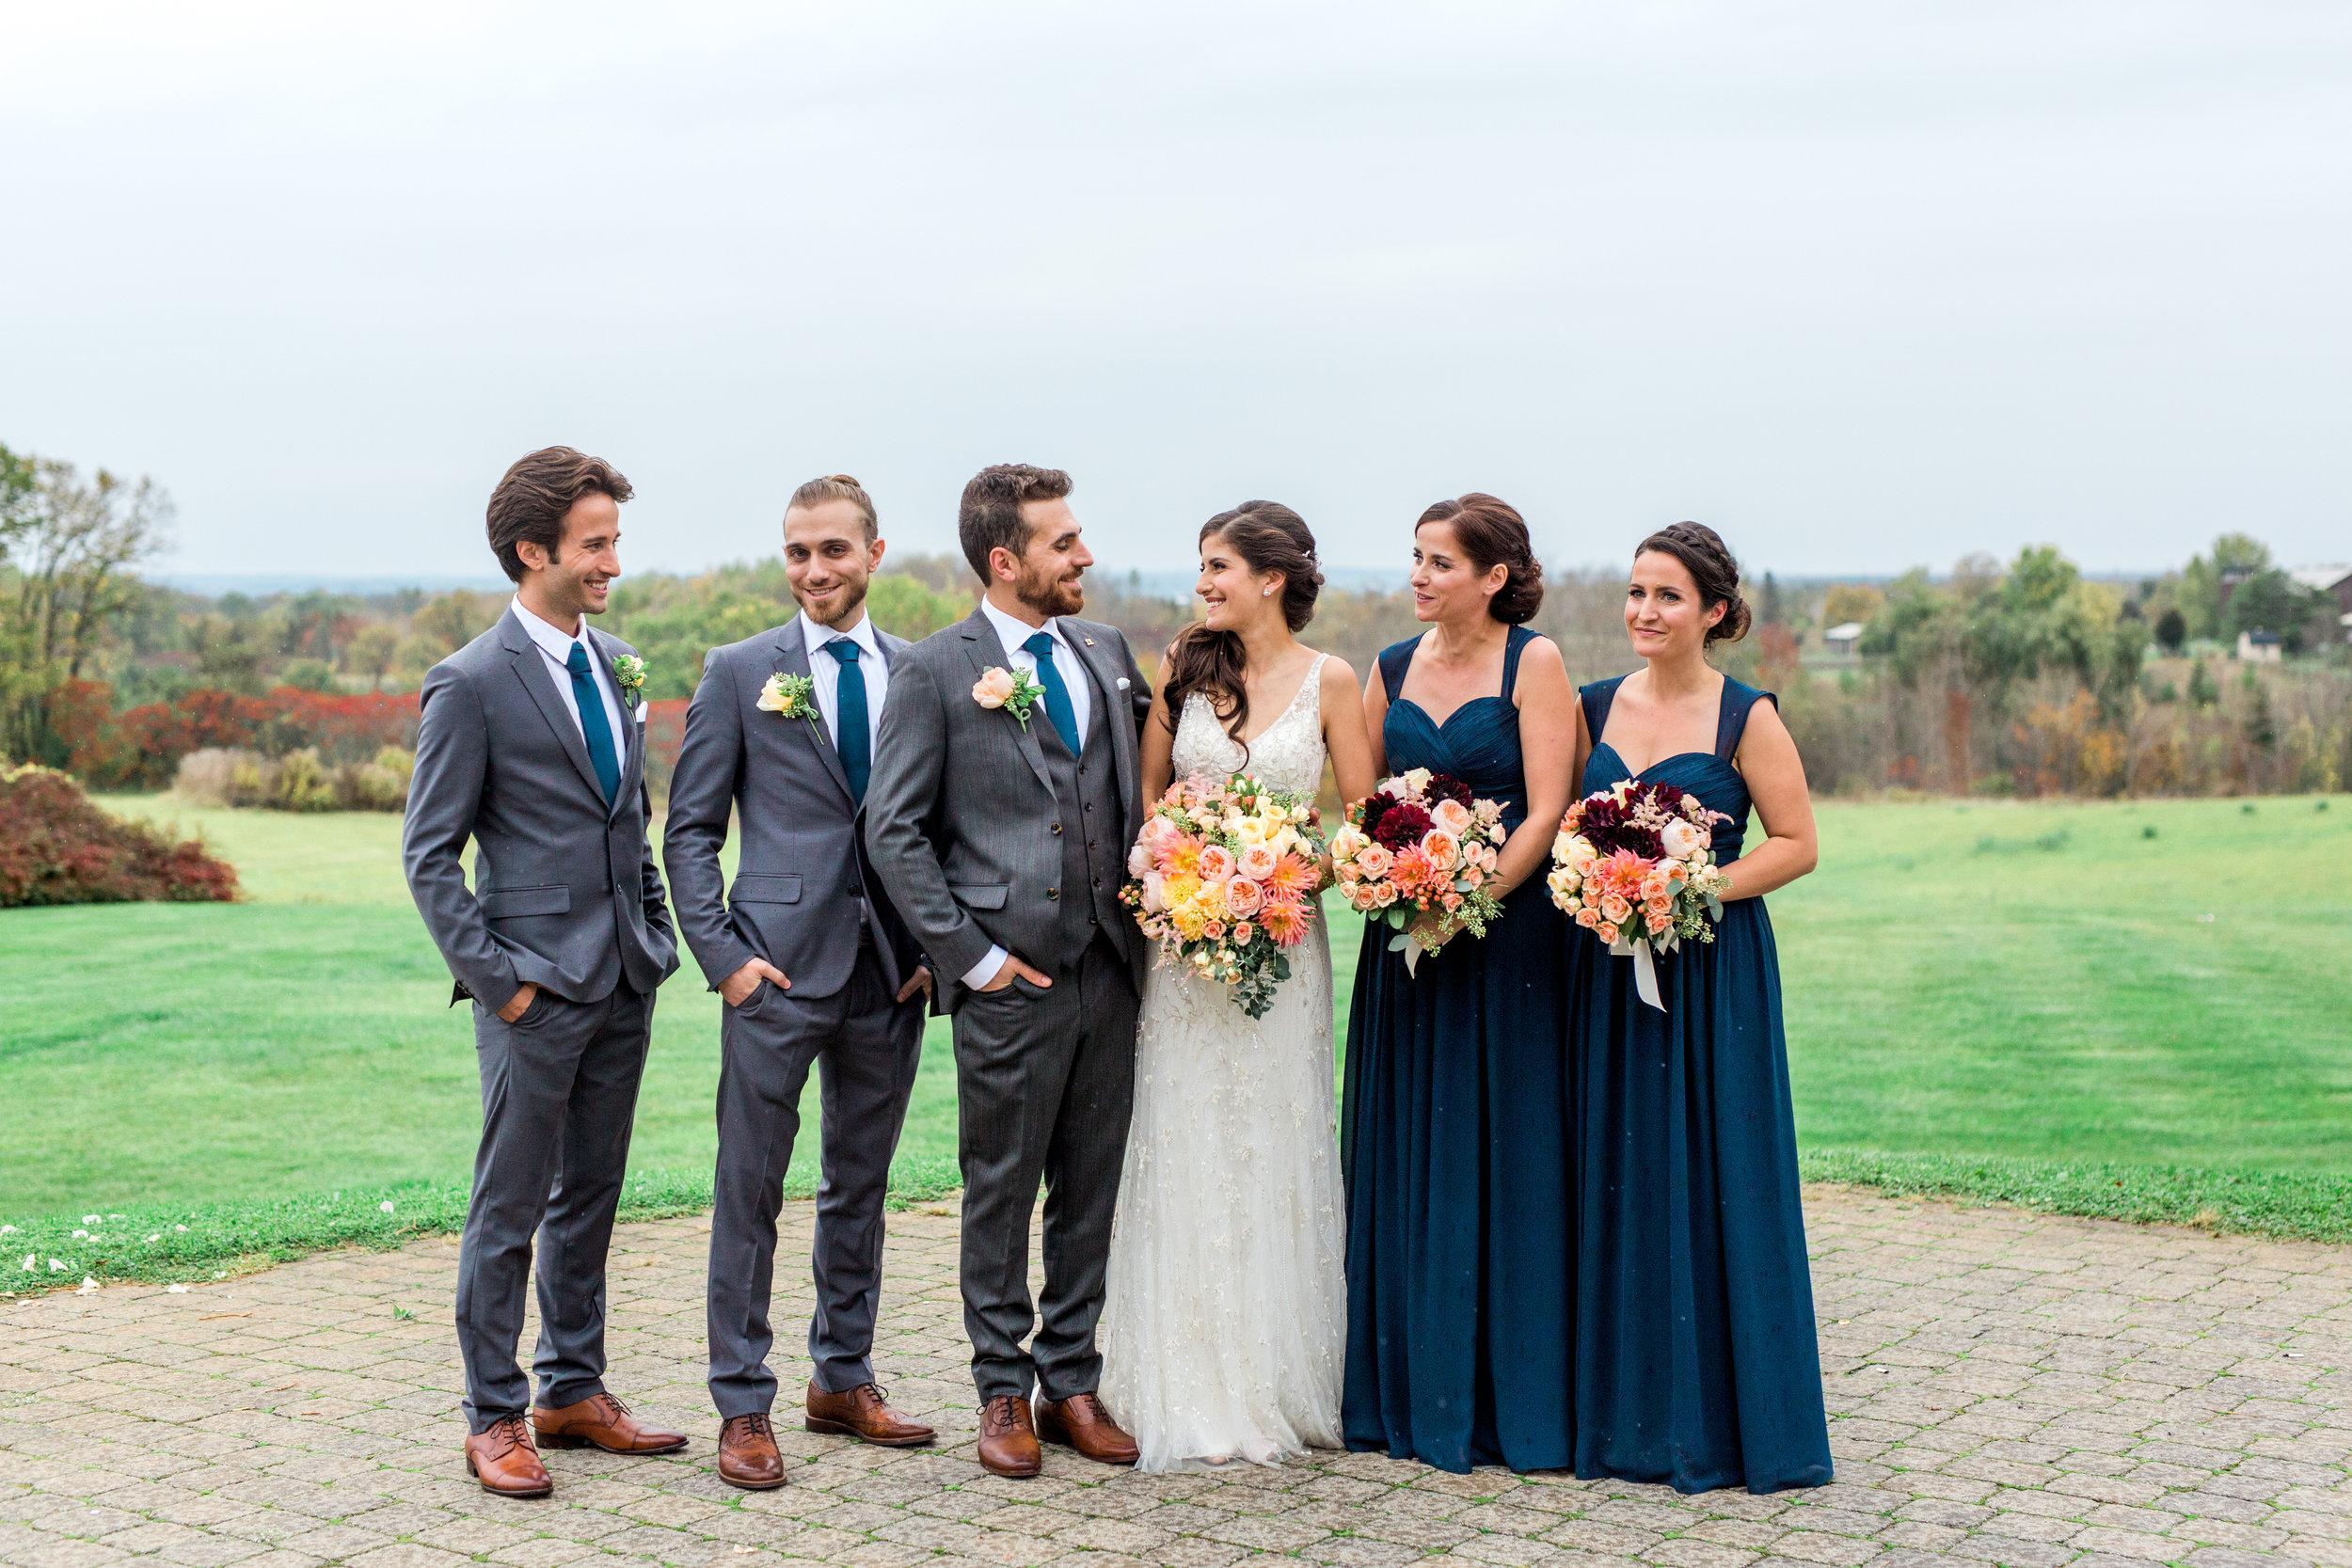 Amir-Golbazi-Danielle-Giroux-Photography_Toronto-Wedding_Cedarwood_Rachel-Paul_399.jpg